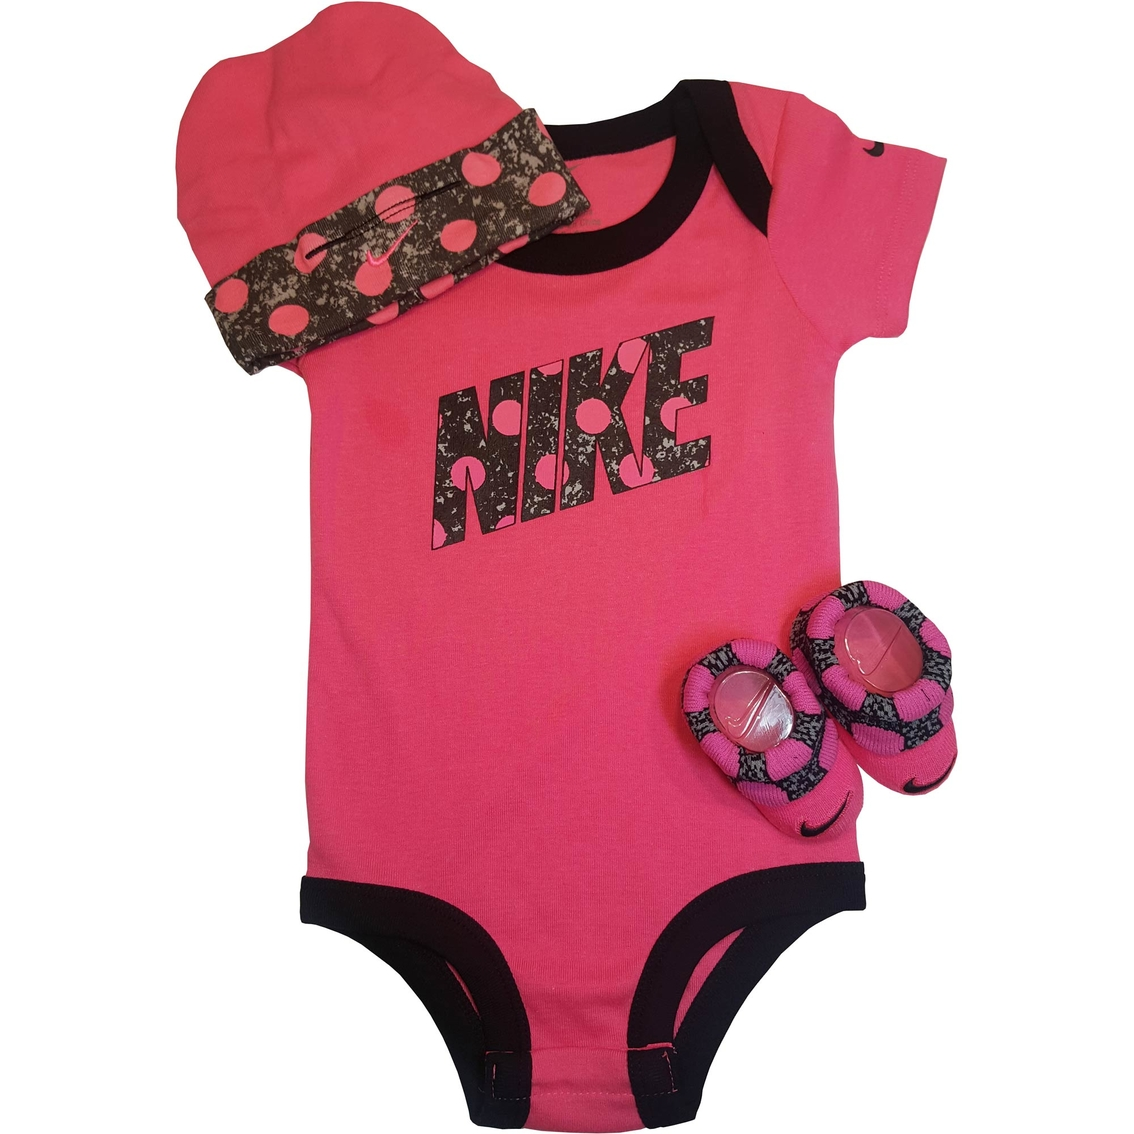 Nike Infant Girls Polka Dots 3 pc. Set